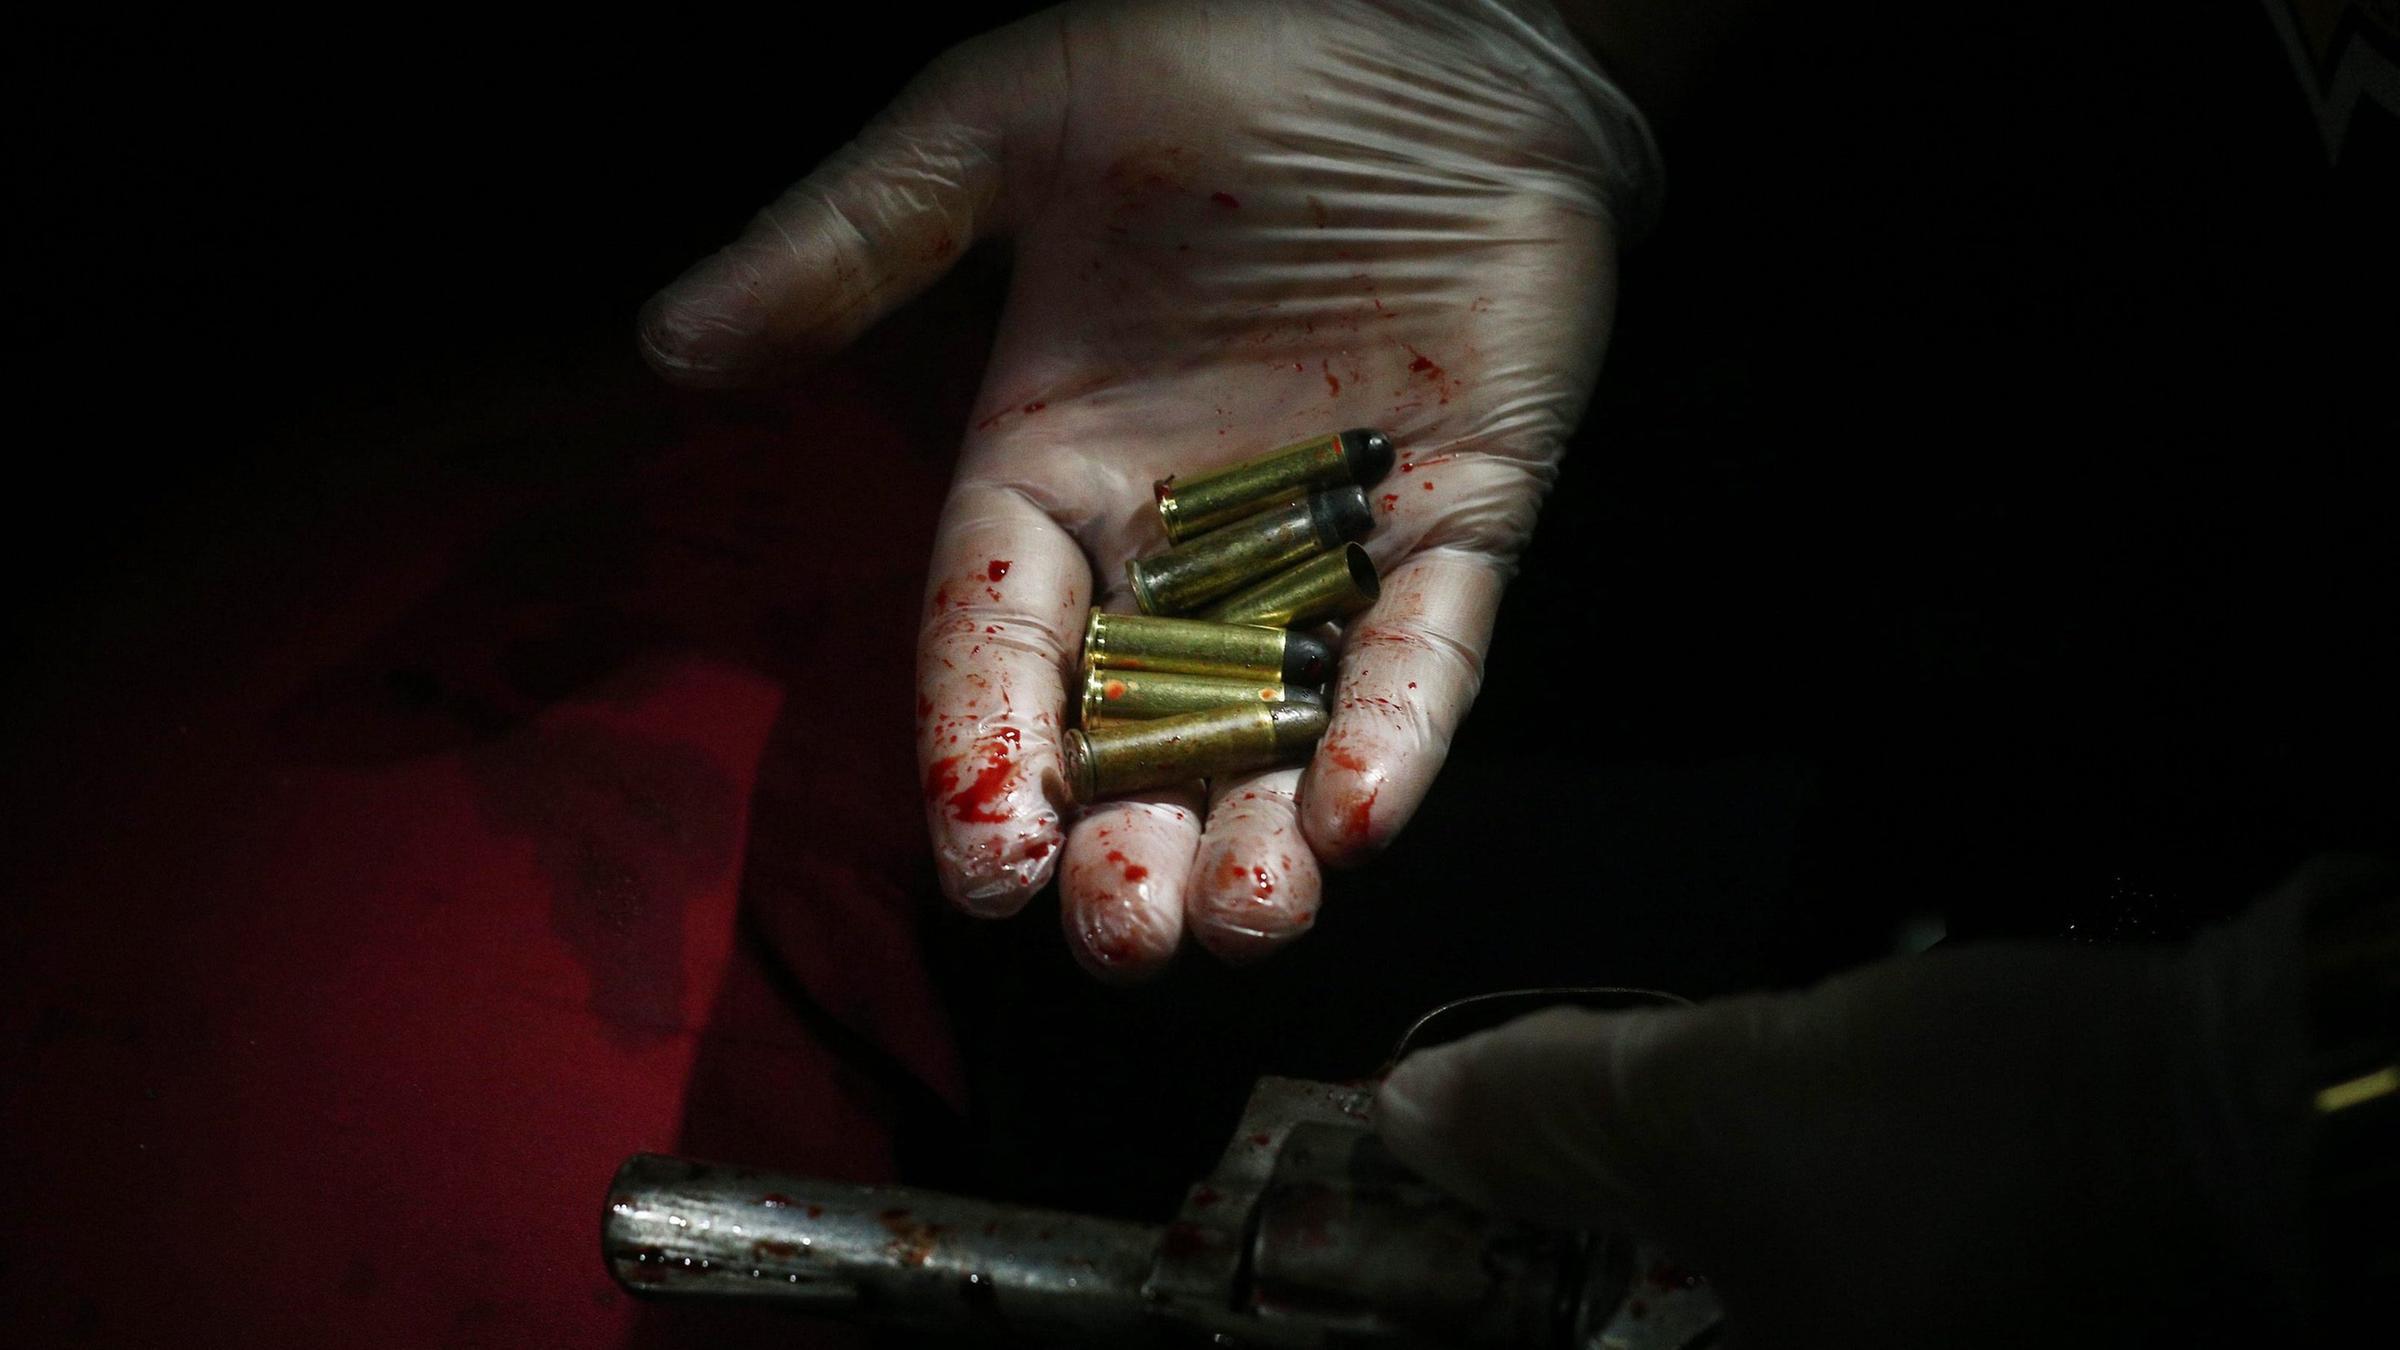 Mexiko Kartell Brücke.Drogenkrieg In Mexiko Kartell Knüpft Tote An Brücke Auf Zdfmediathek